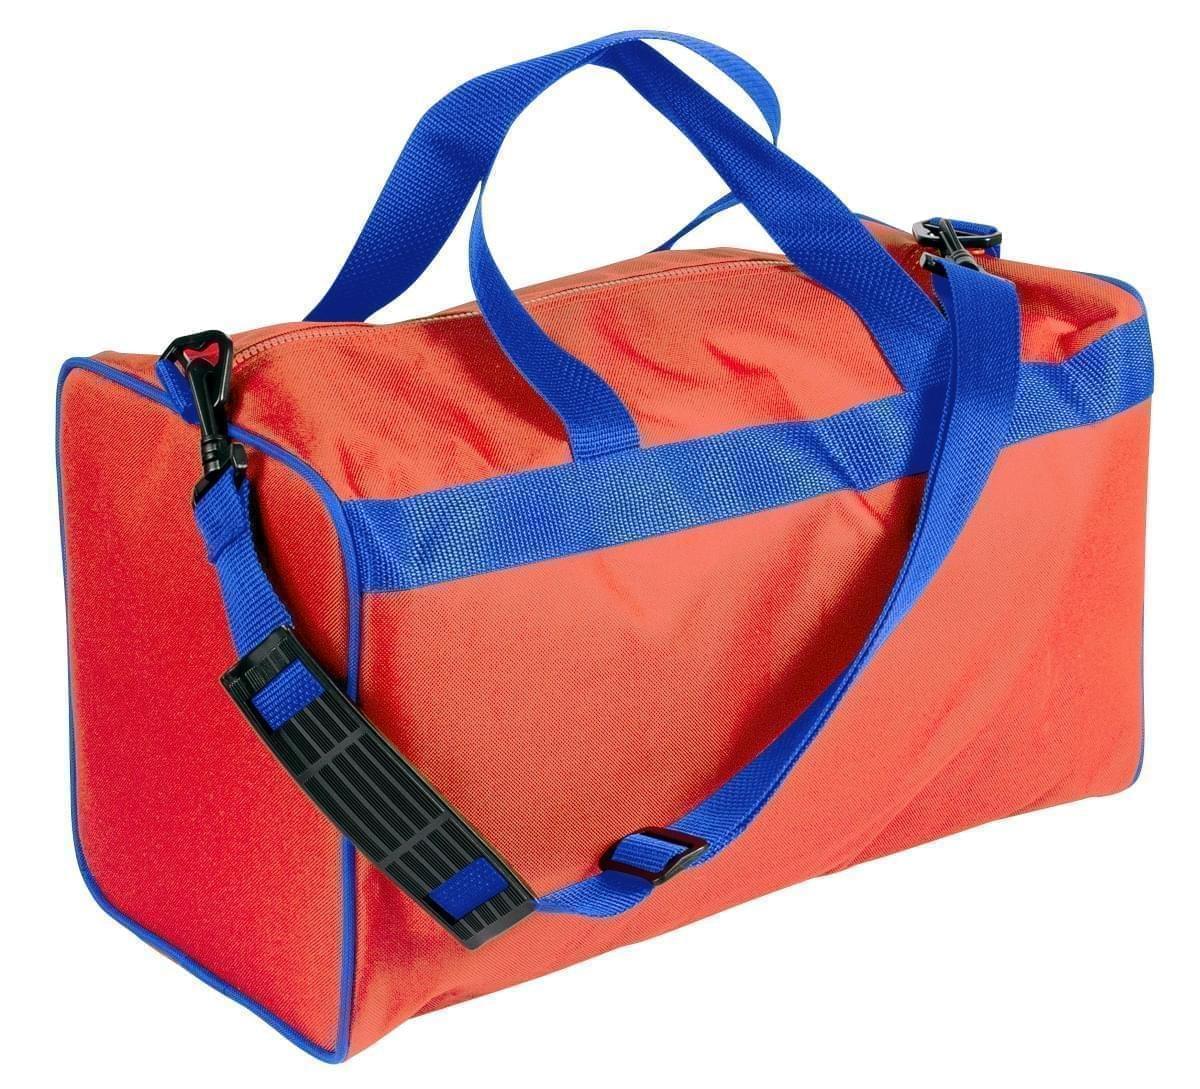 USA Made Nylon Poly Weekend Duffles, Orange-Royal Blue, WLKX31AAX3